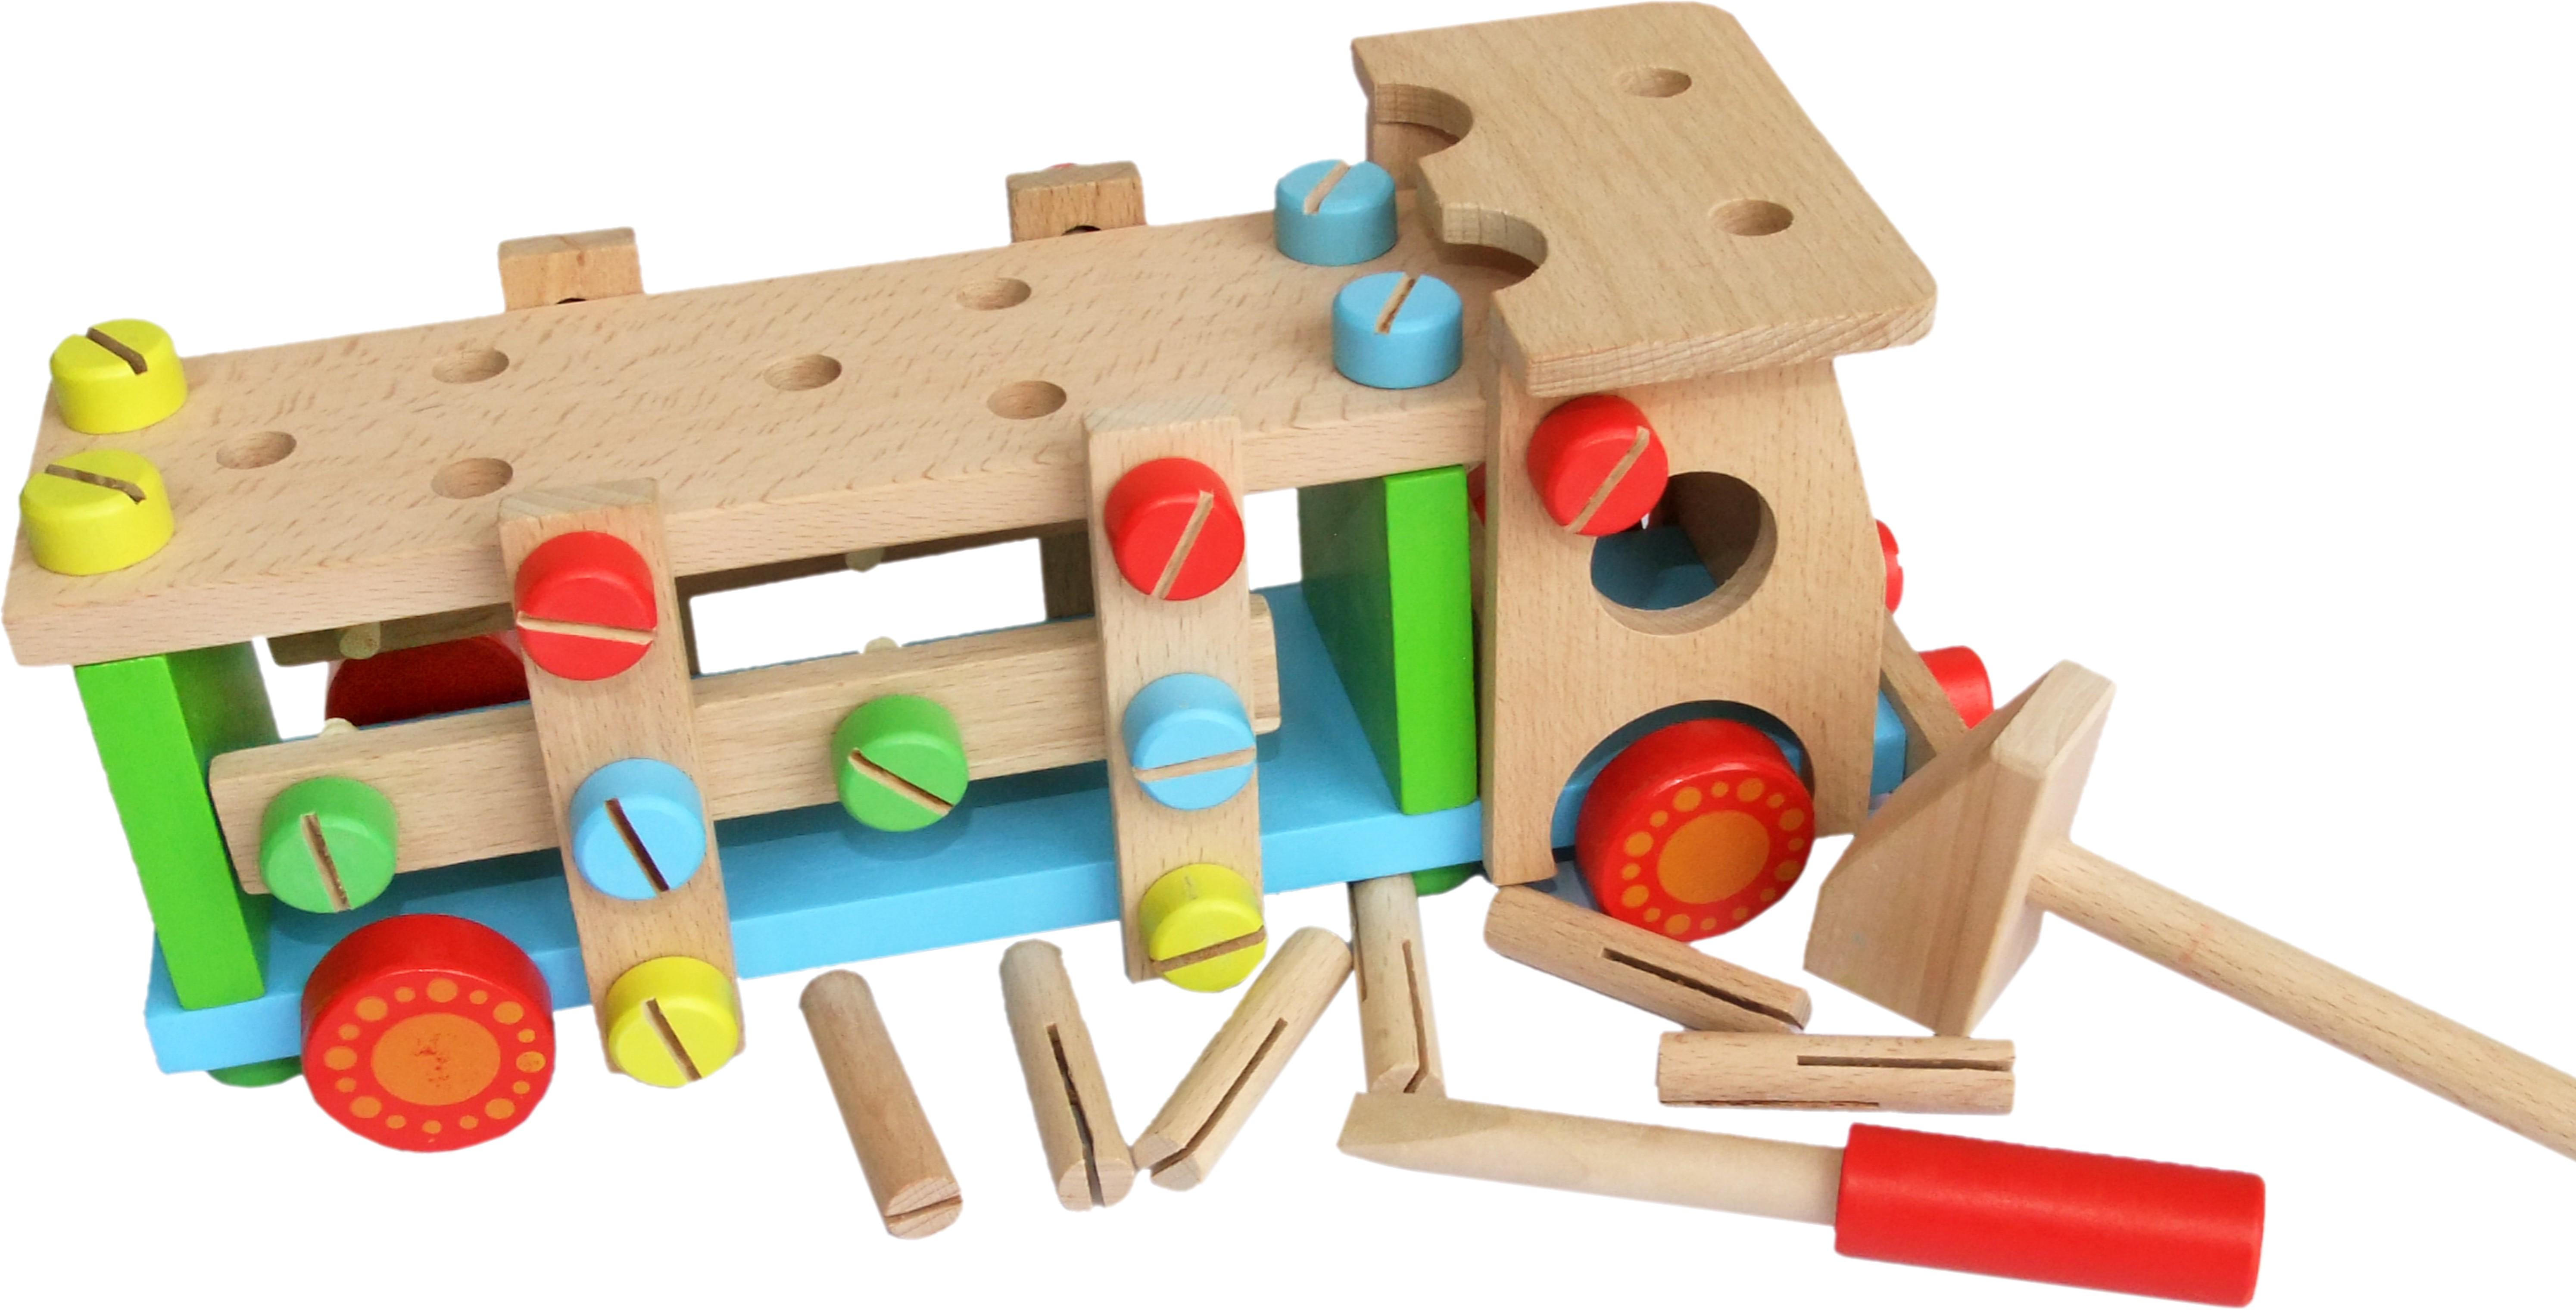 Wooden Take Apart Screw Truck | GLOPO Inc